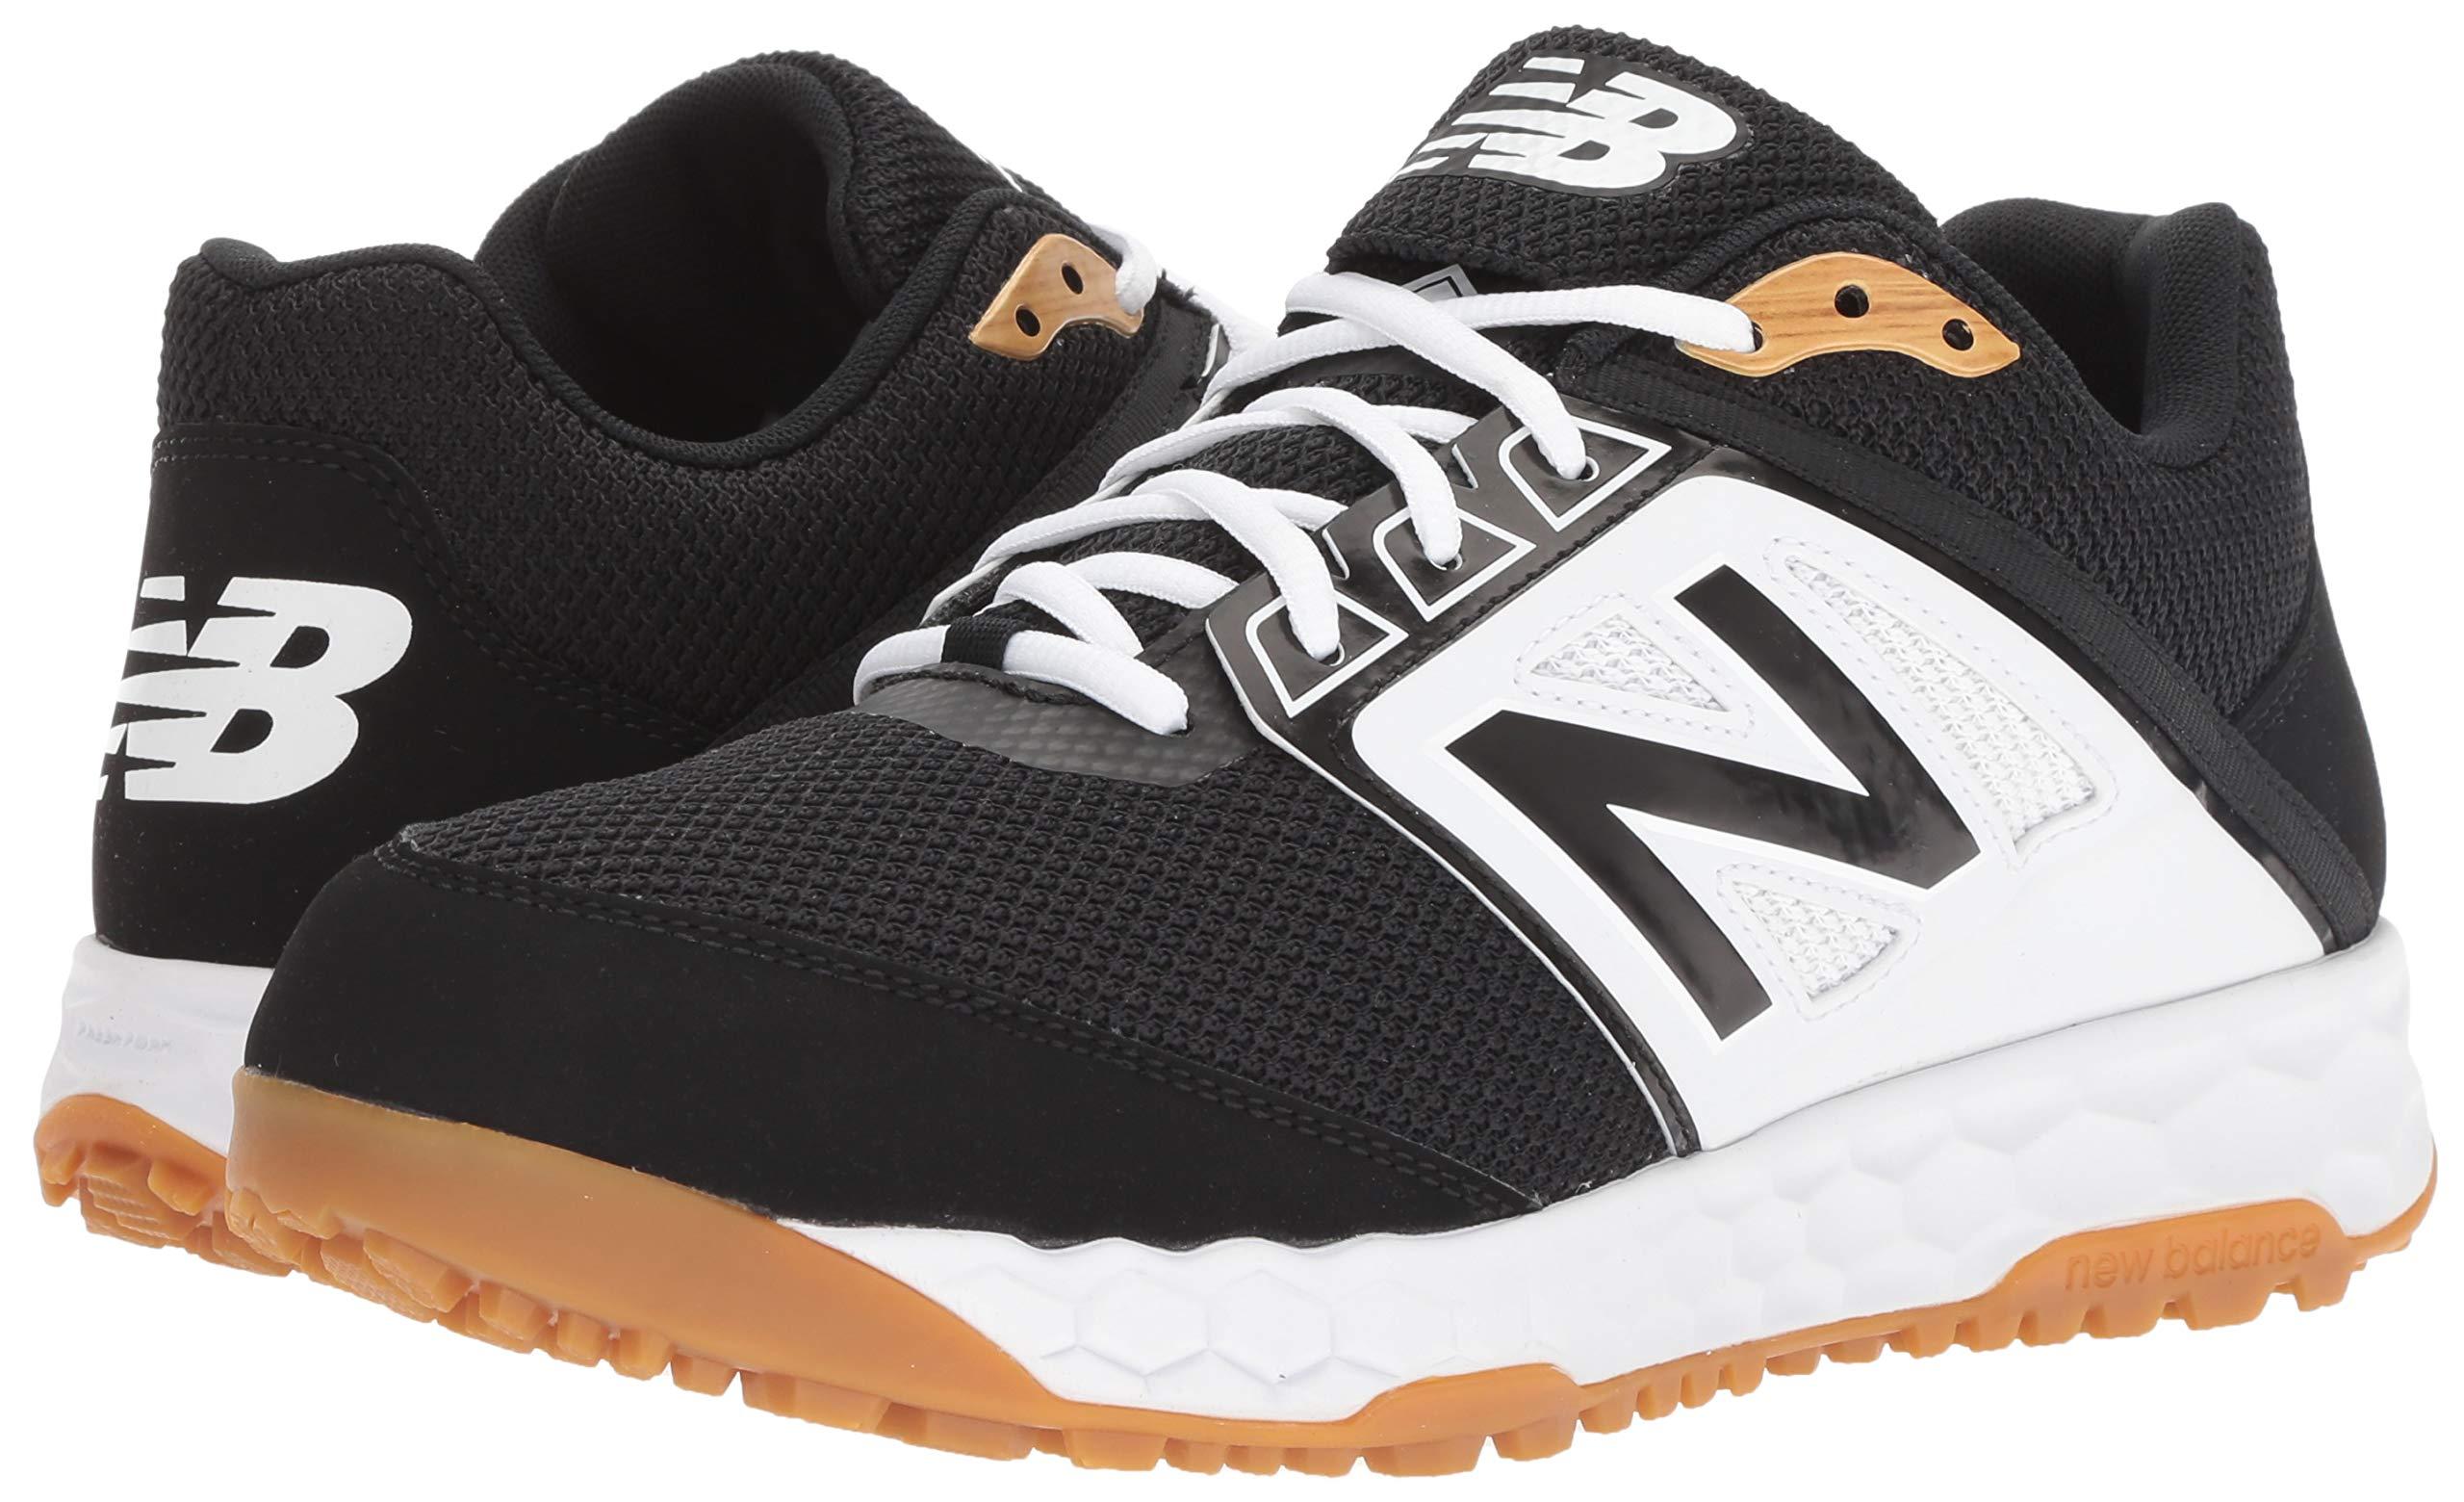 New Balance Men's 3000v4 Turf Baseball Shoe, Black/White, 5 D US by New Balance (Image #6)